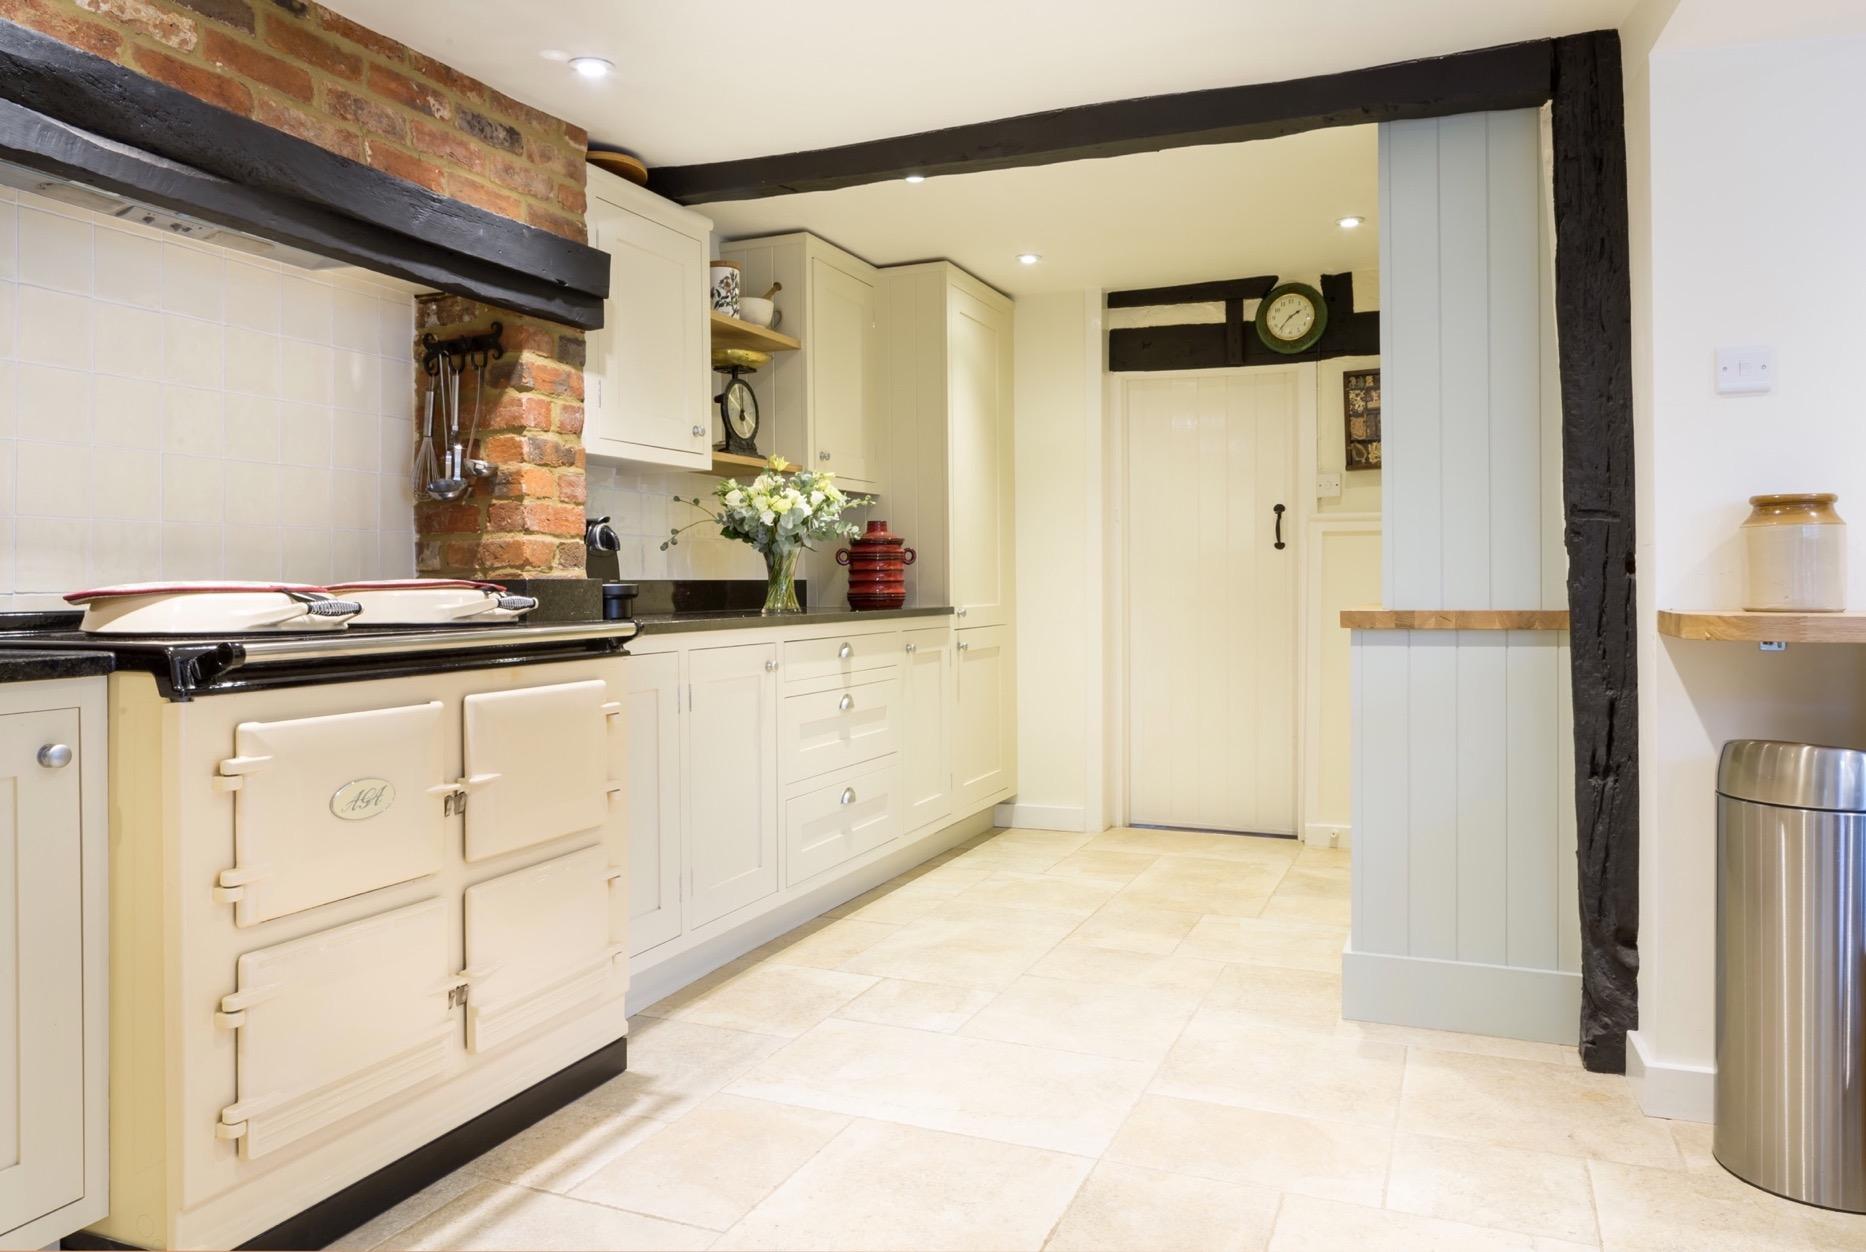 Handpainted kitchen Aga range cooker granite worktop amersham buckinghamshire bespoke kitchen inframe 3